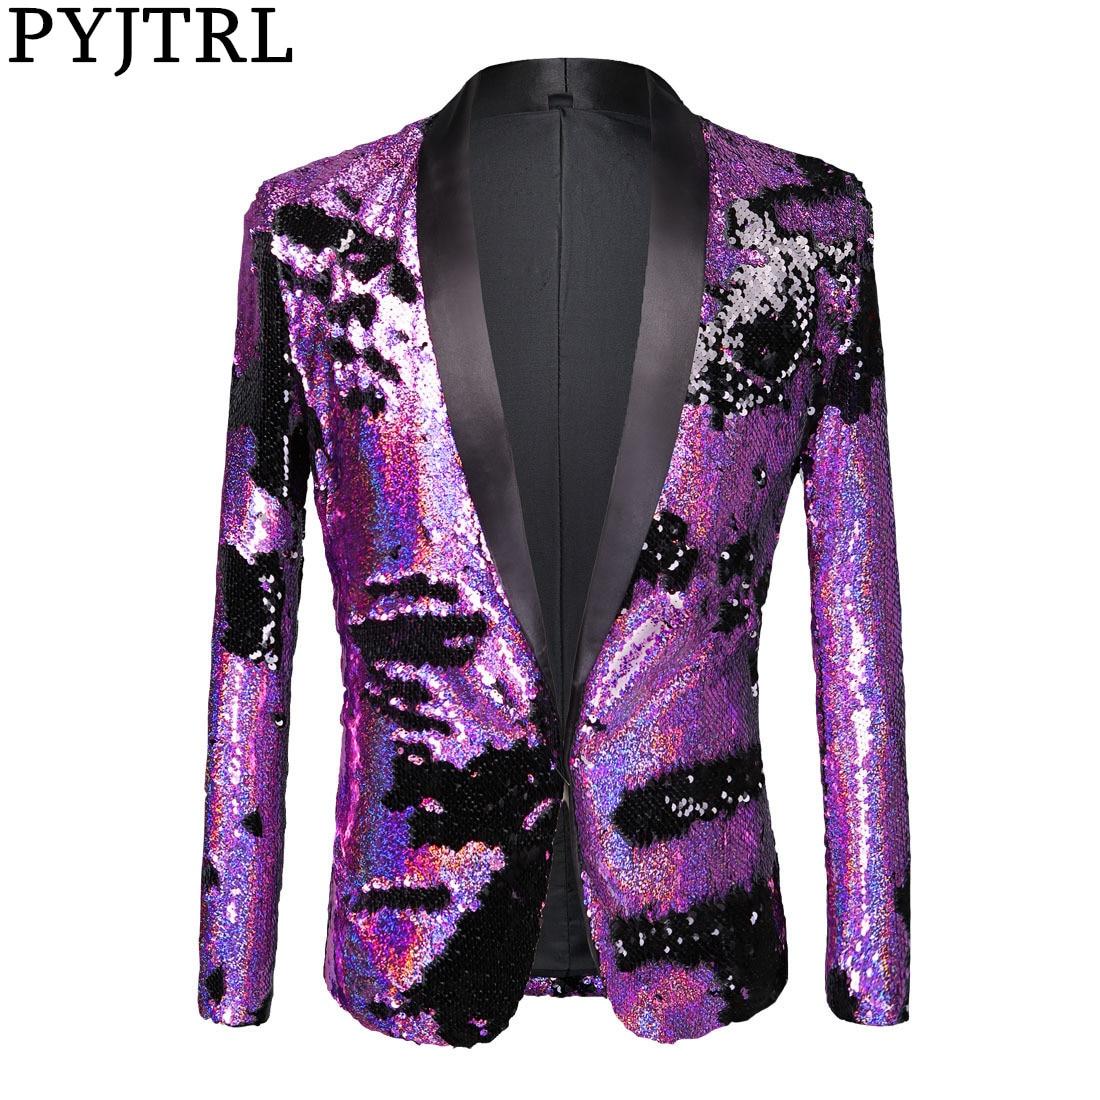 PYJTRL Full Sequins Series Men Double-Color Purple Black Sequins Blazer Fashion Nightclub Bar DJ Singers Suit Jacket Costumes